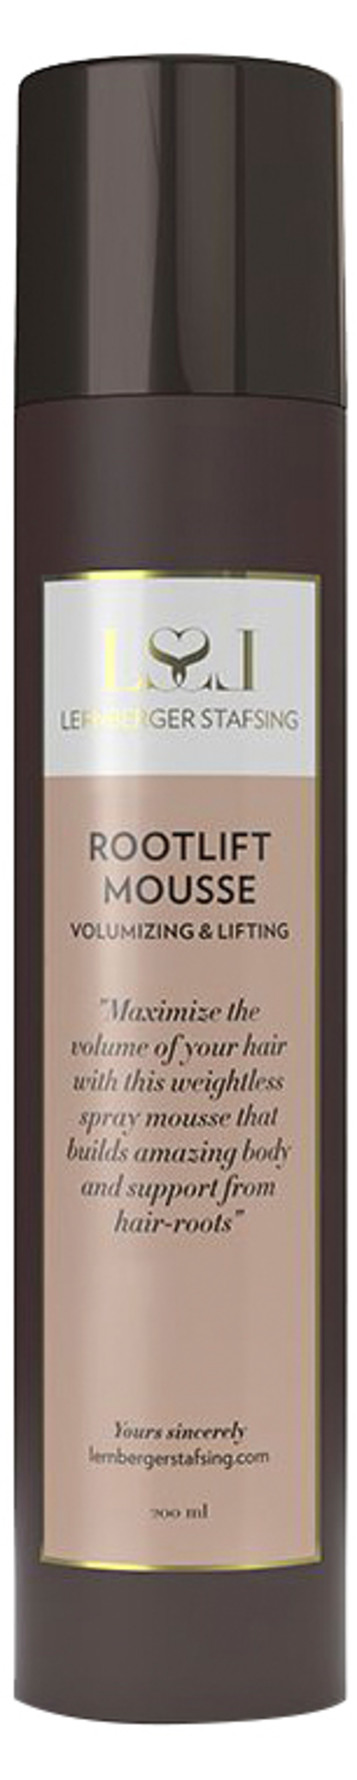 lernberger stafsing rootlift mousse